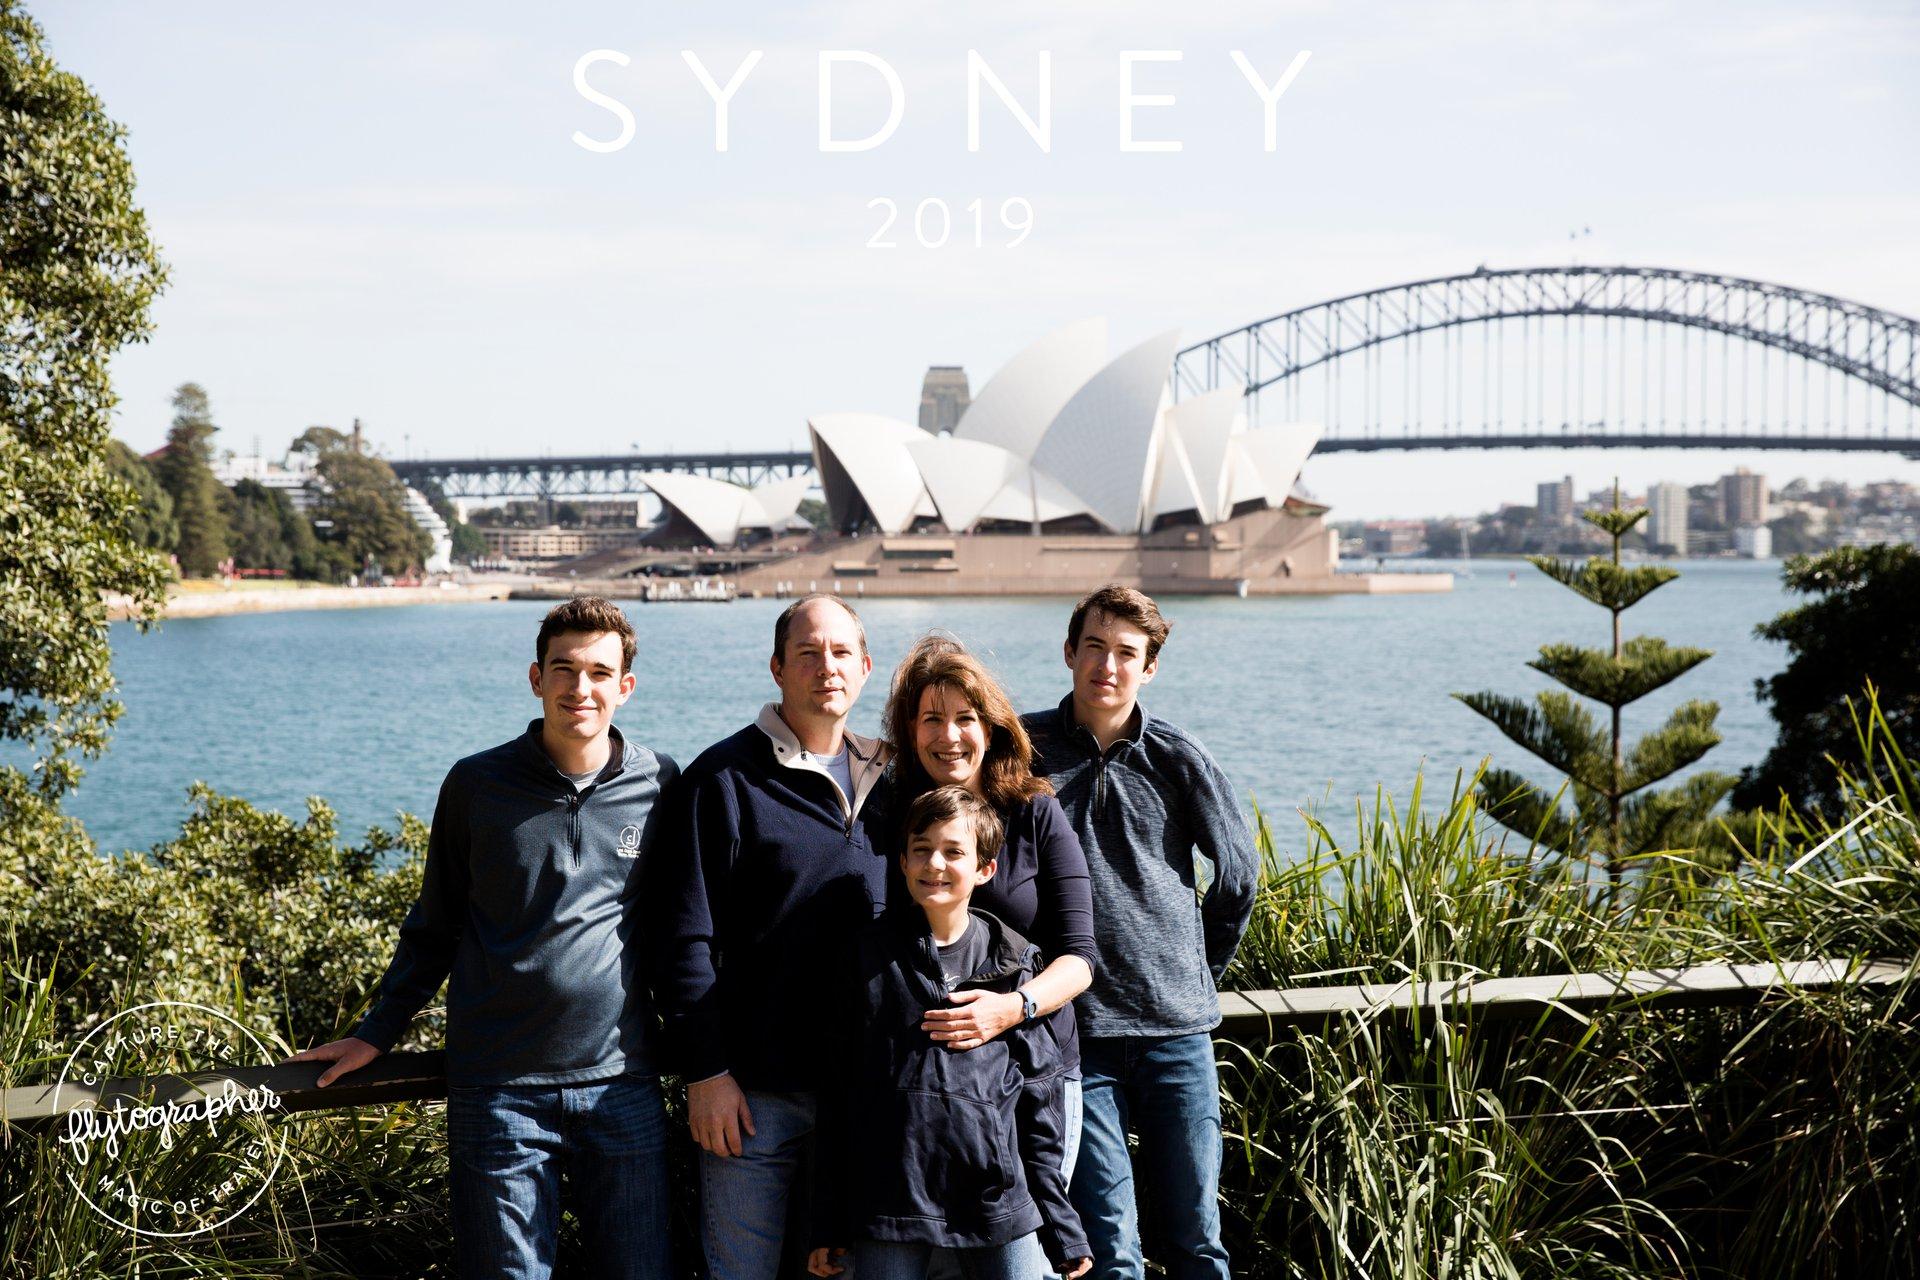 Flytographer Travel Story - Gallagher Family in Sydney, Australia 2019